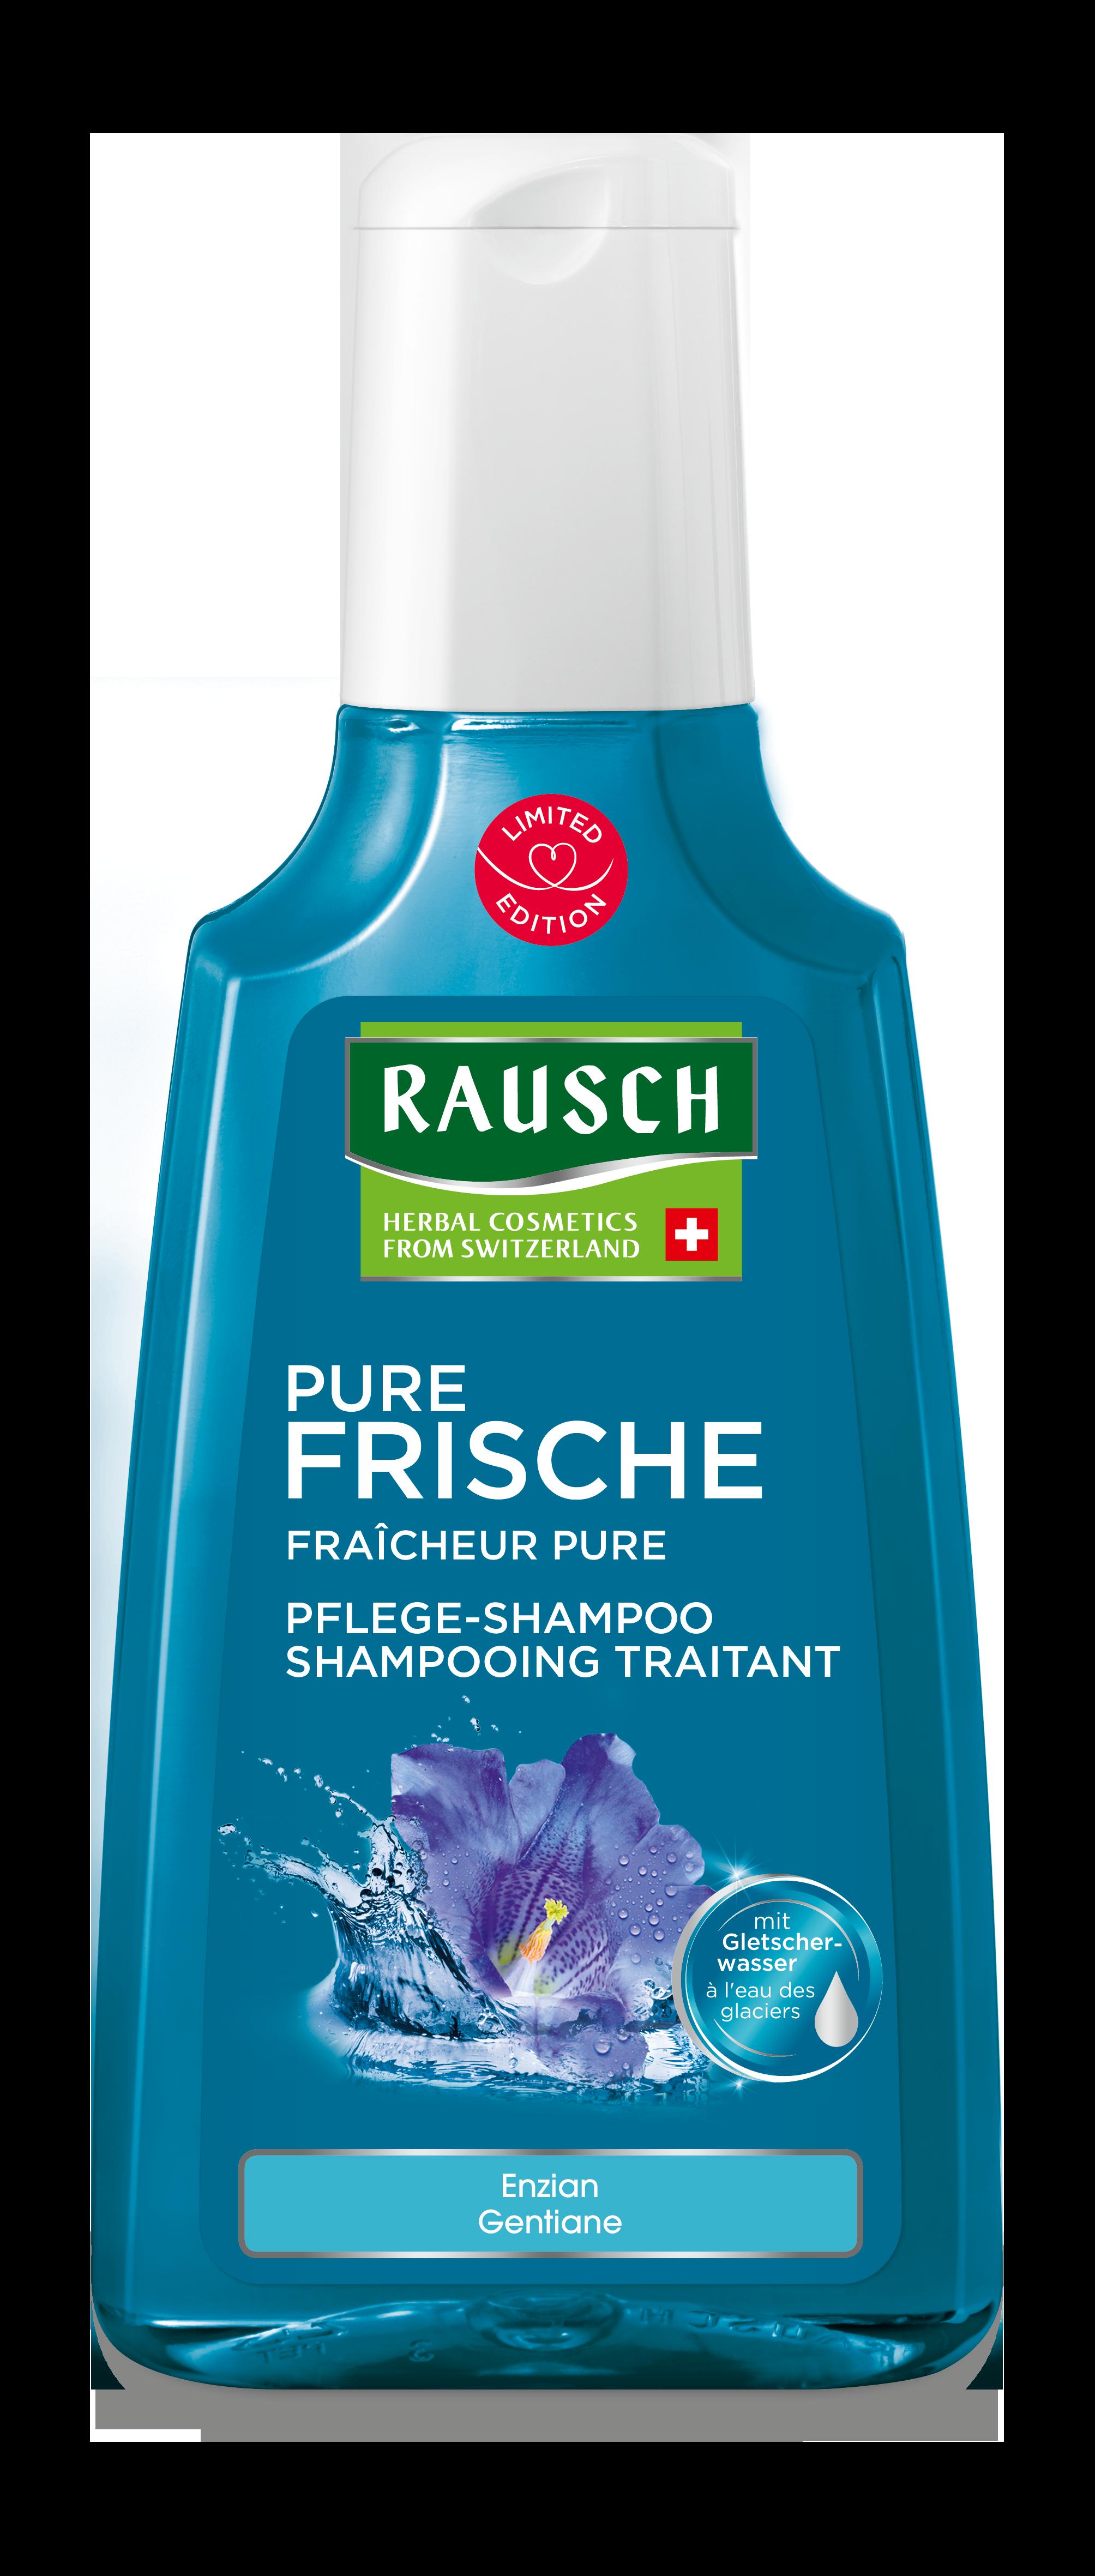 Rausch Enzian PFLEGE-SHAMPOO